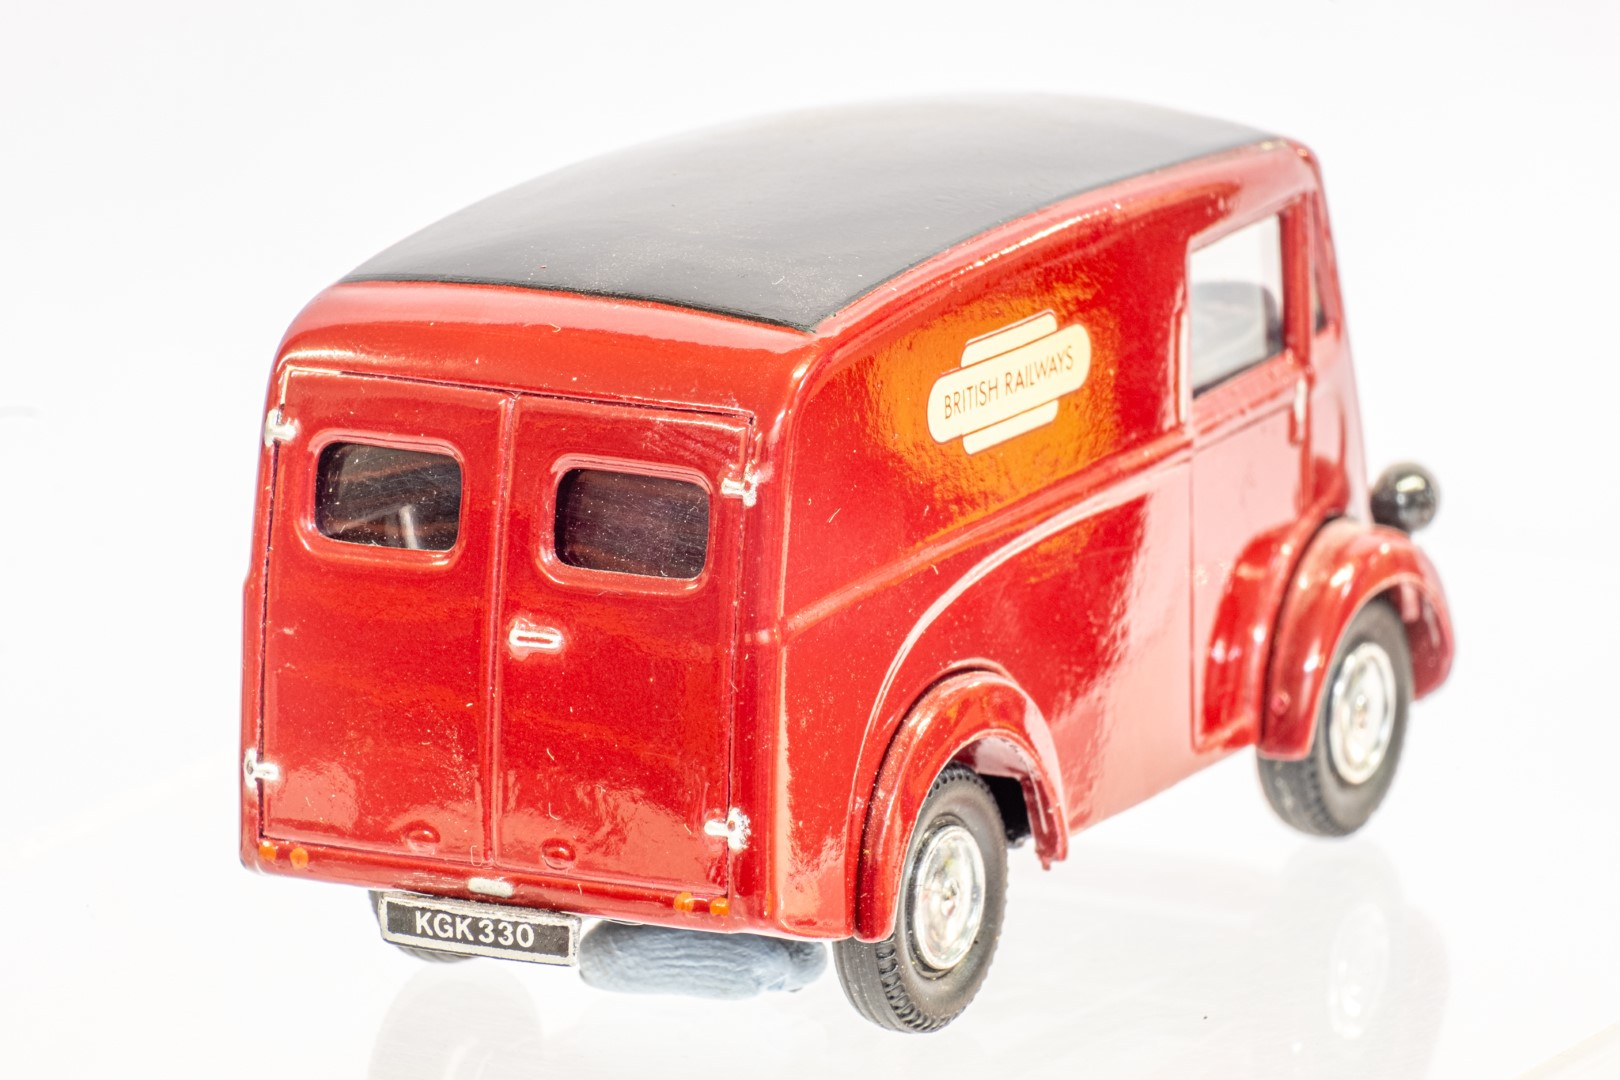 Corgi & Lledo 2 Boxed Models - Service Vans Of the 50's & 60's & Sentinel Ballast - Image 12 of 12